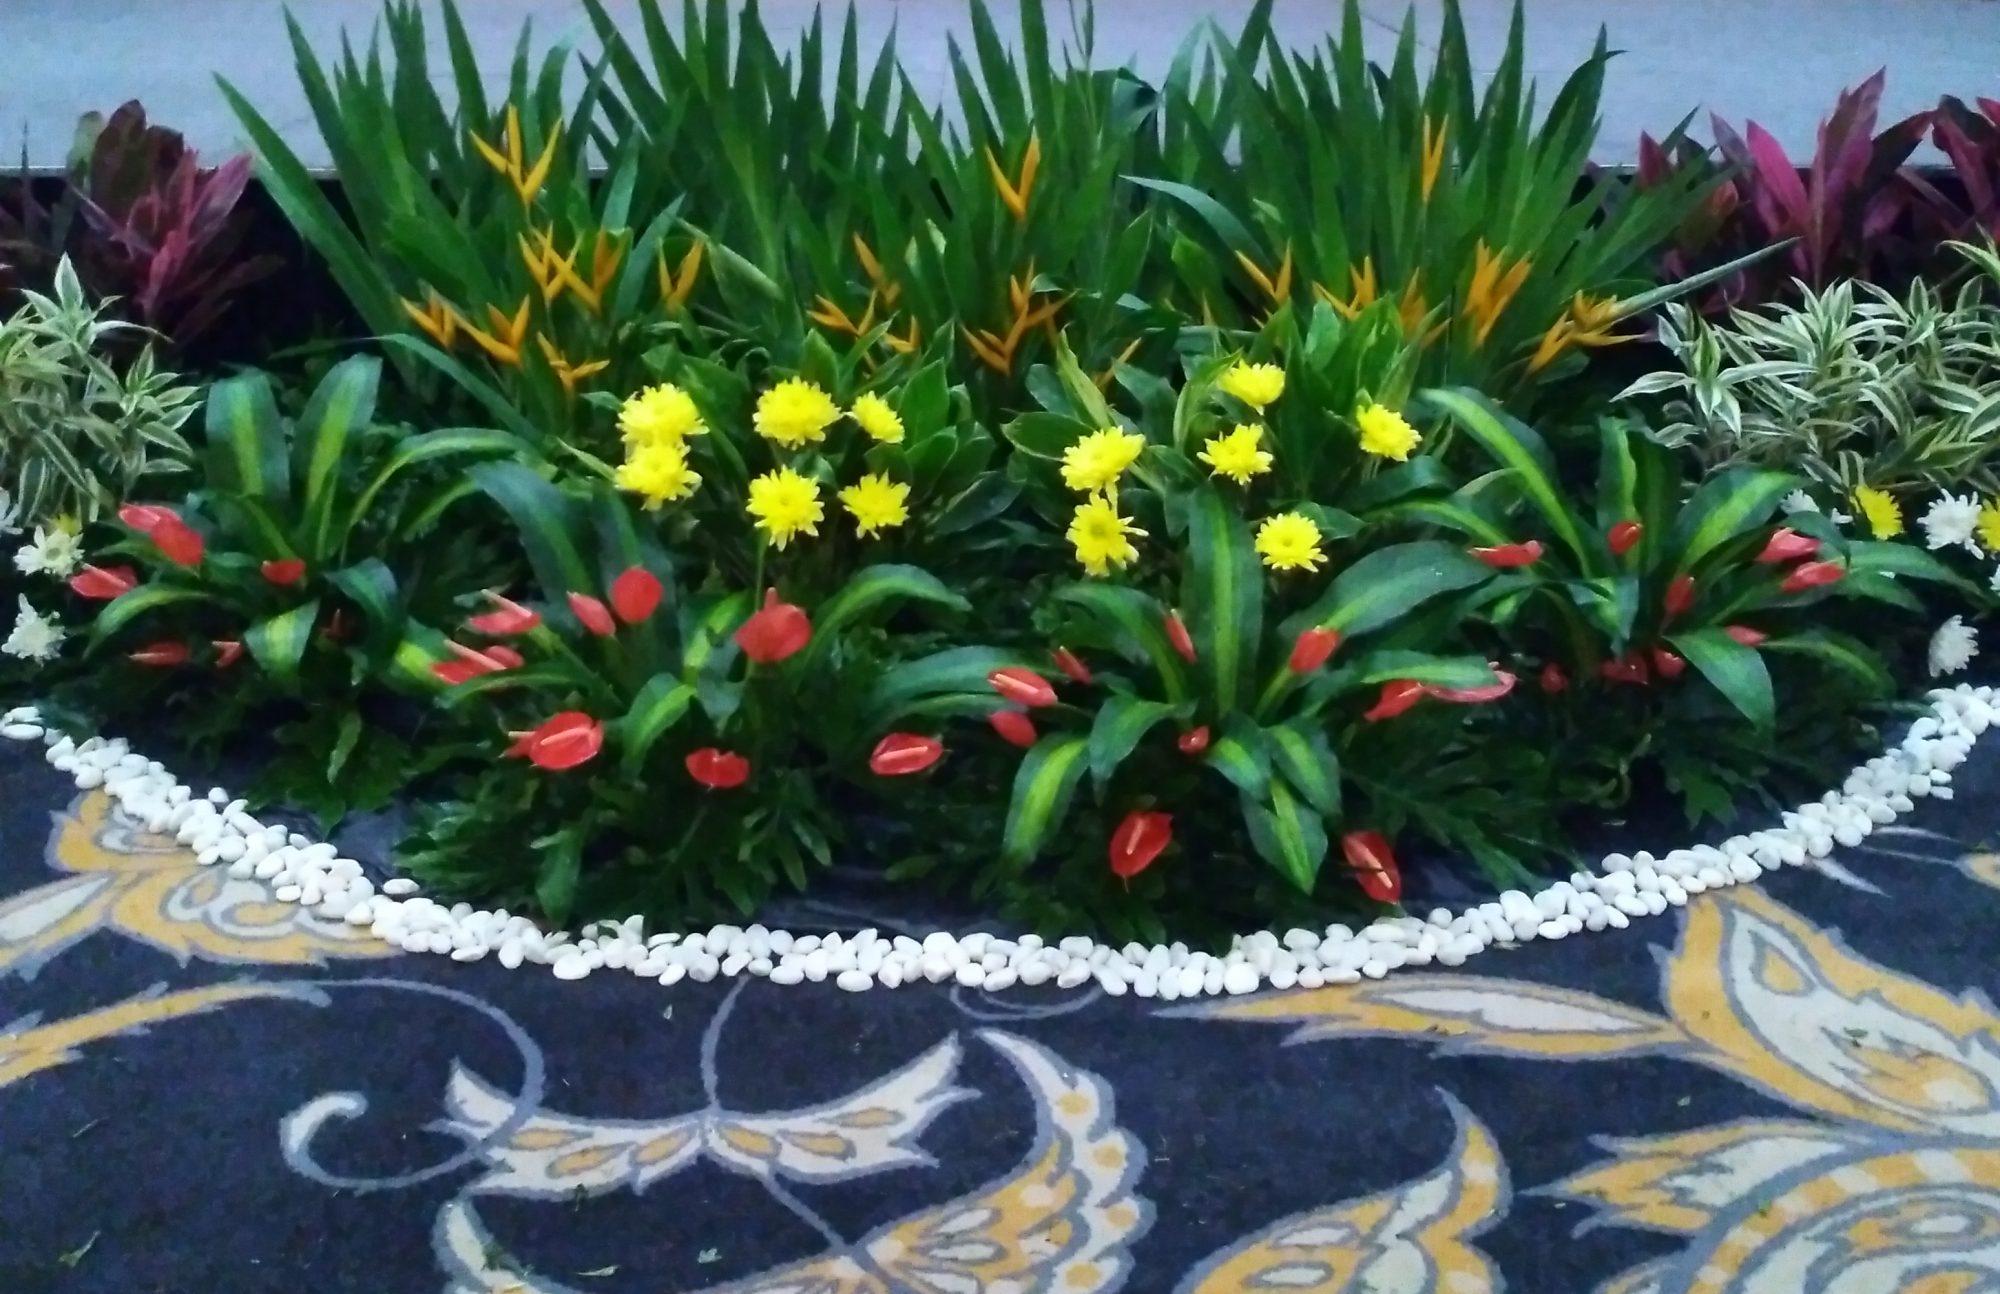 Yasmin florist Bintaro